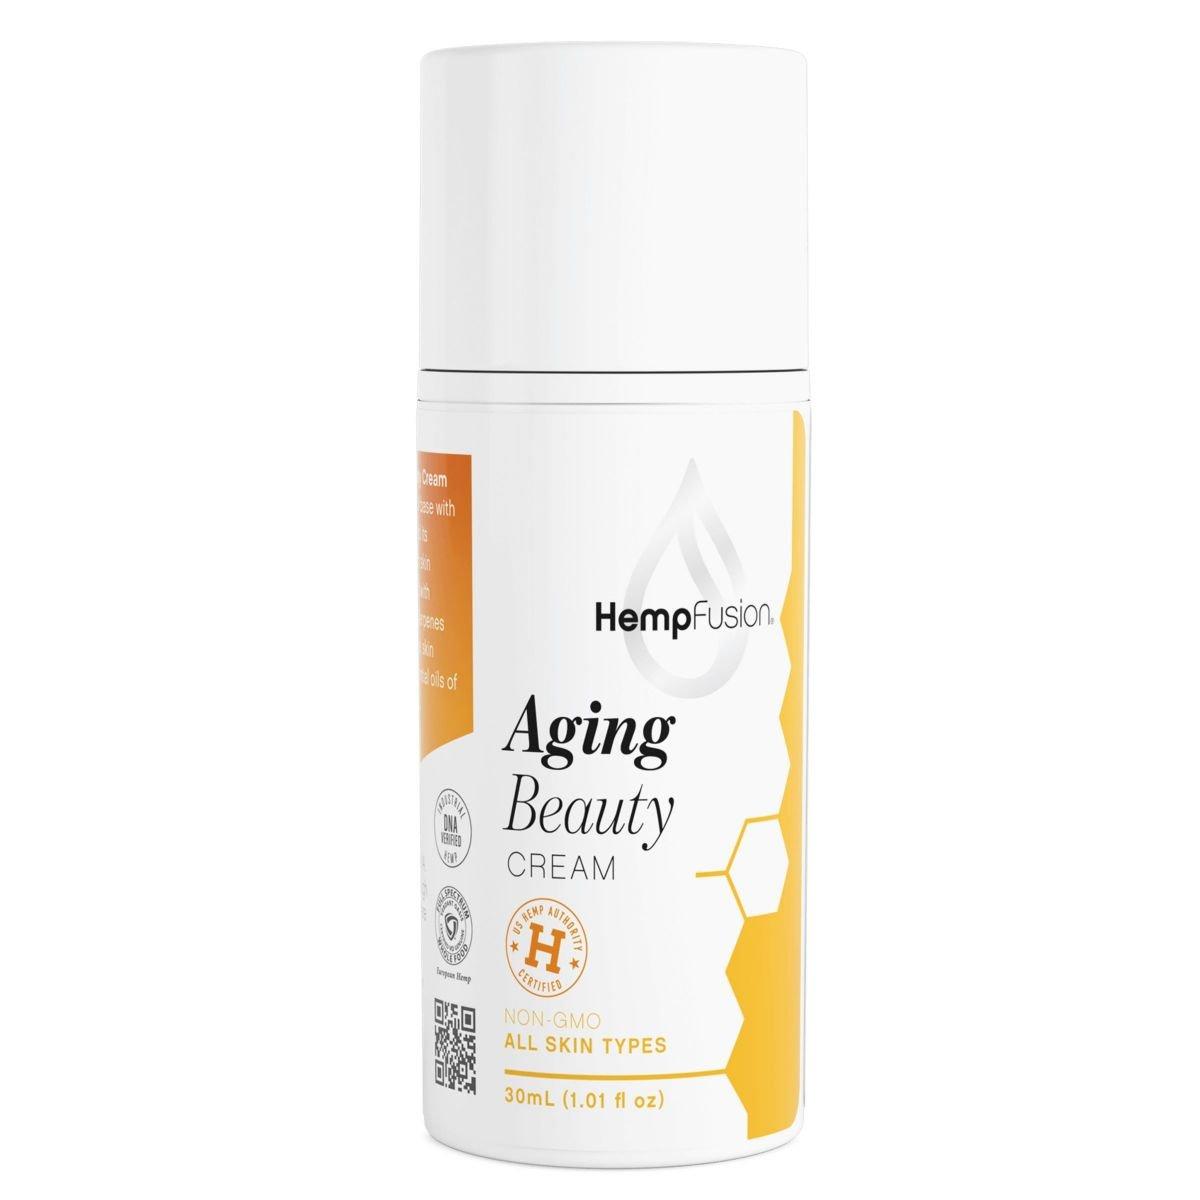 HempFusion CBD Anti Aging Cream